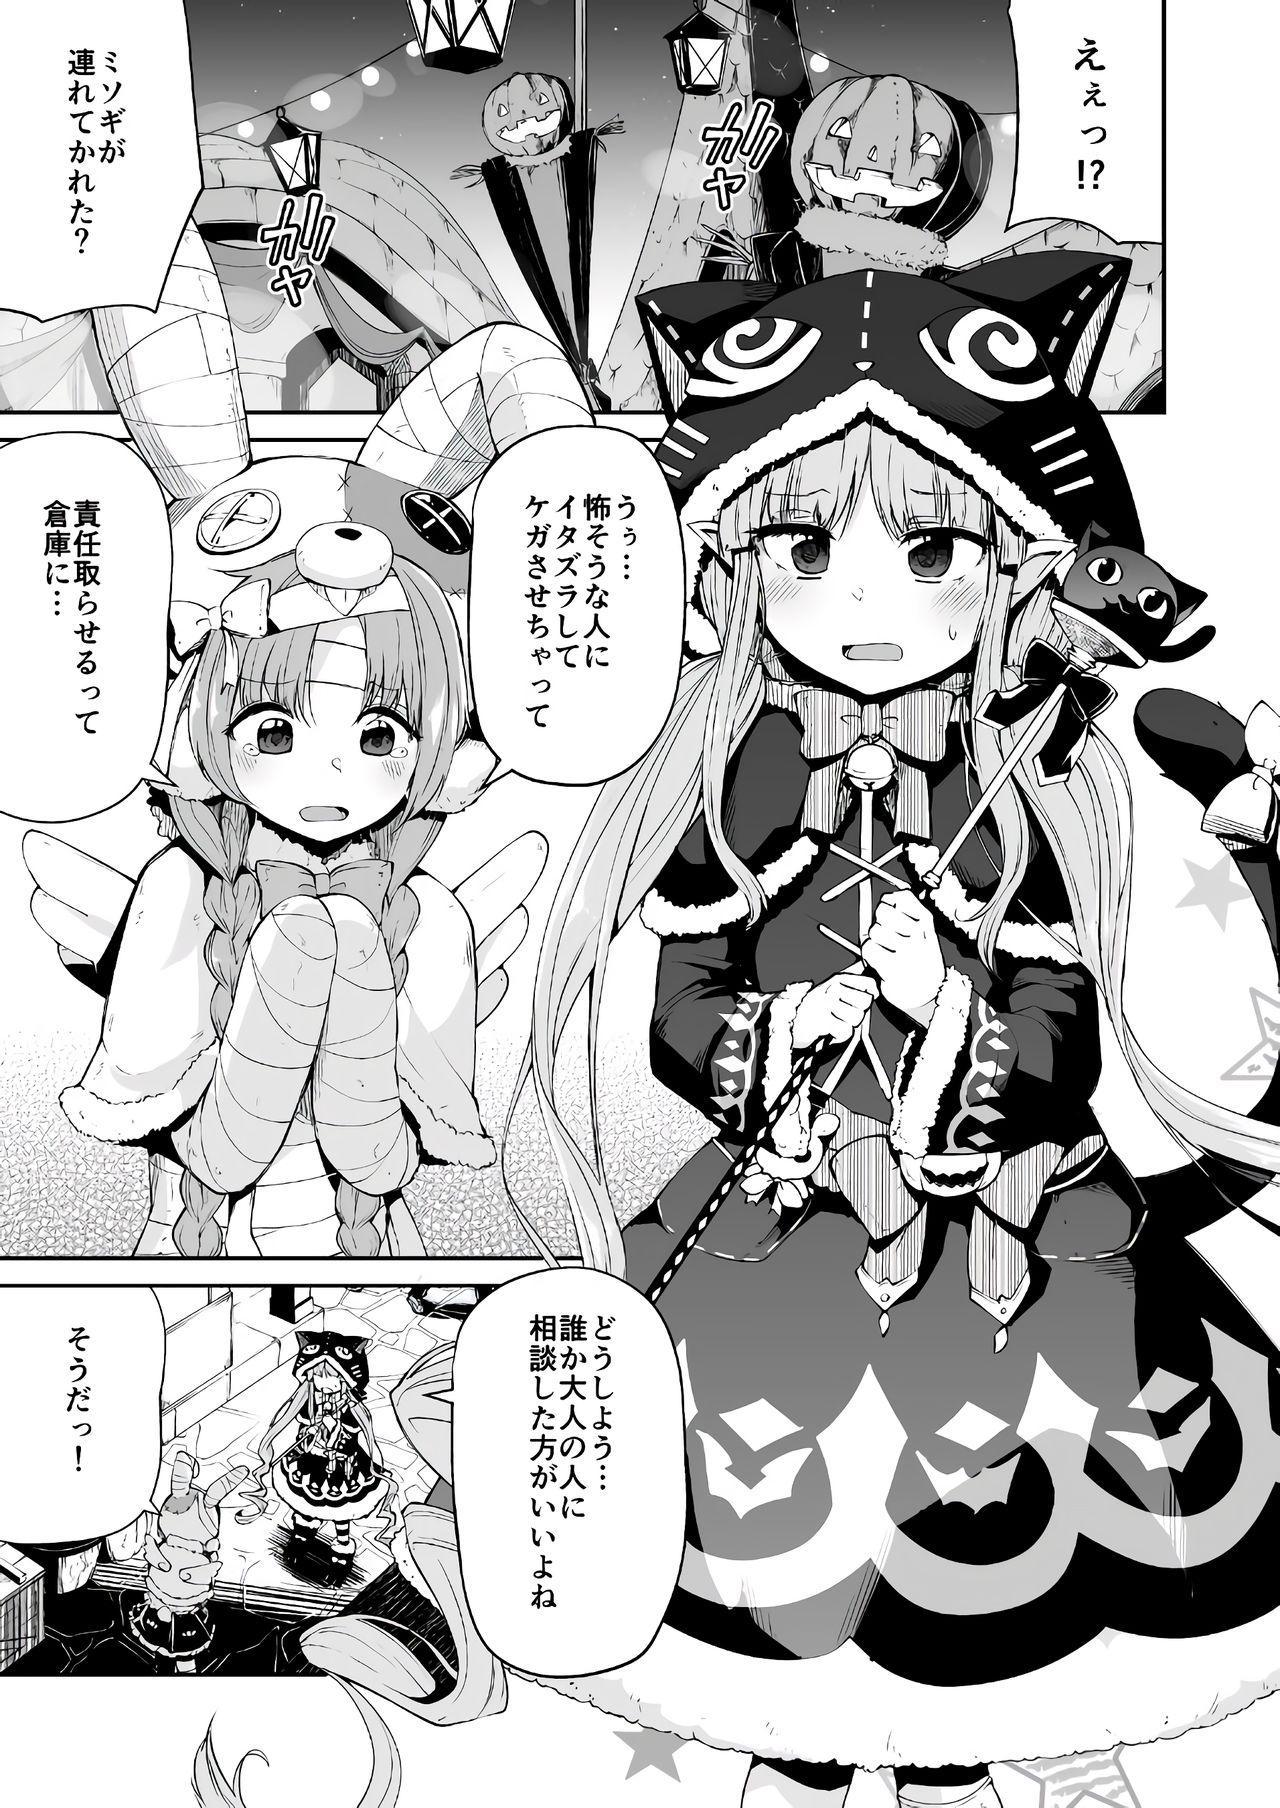 Kyouka-chan to Okashi Party 1